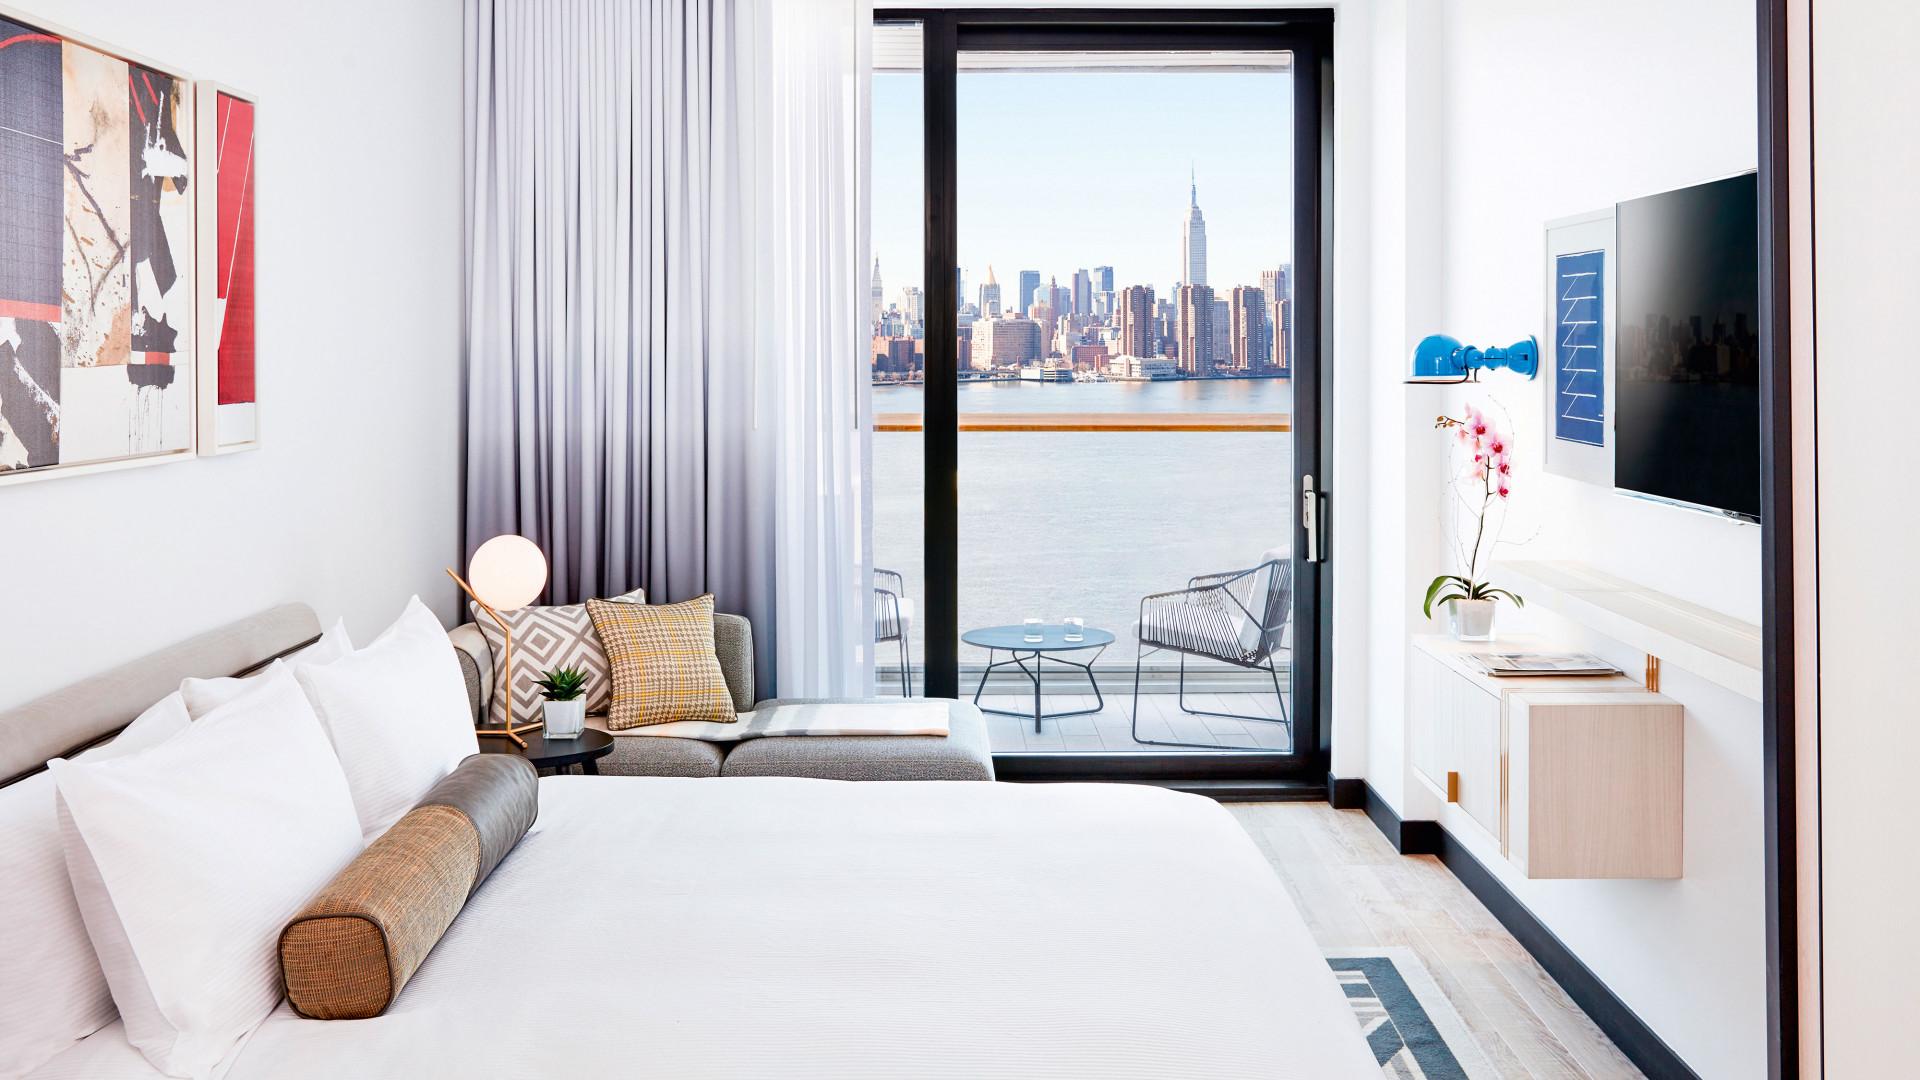 Manhattan seen from an incredible interior in Brooklyn